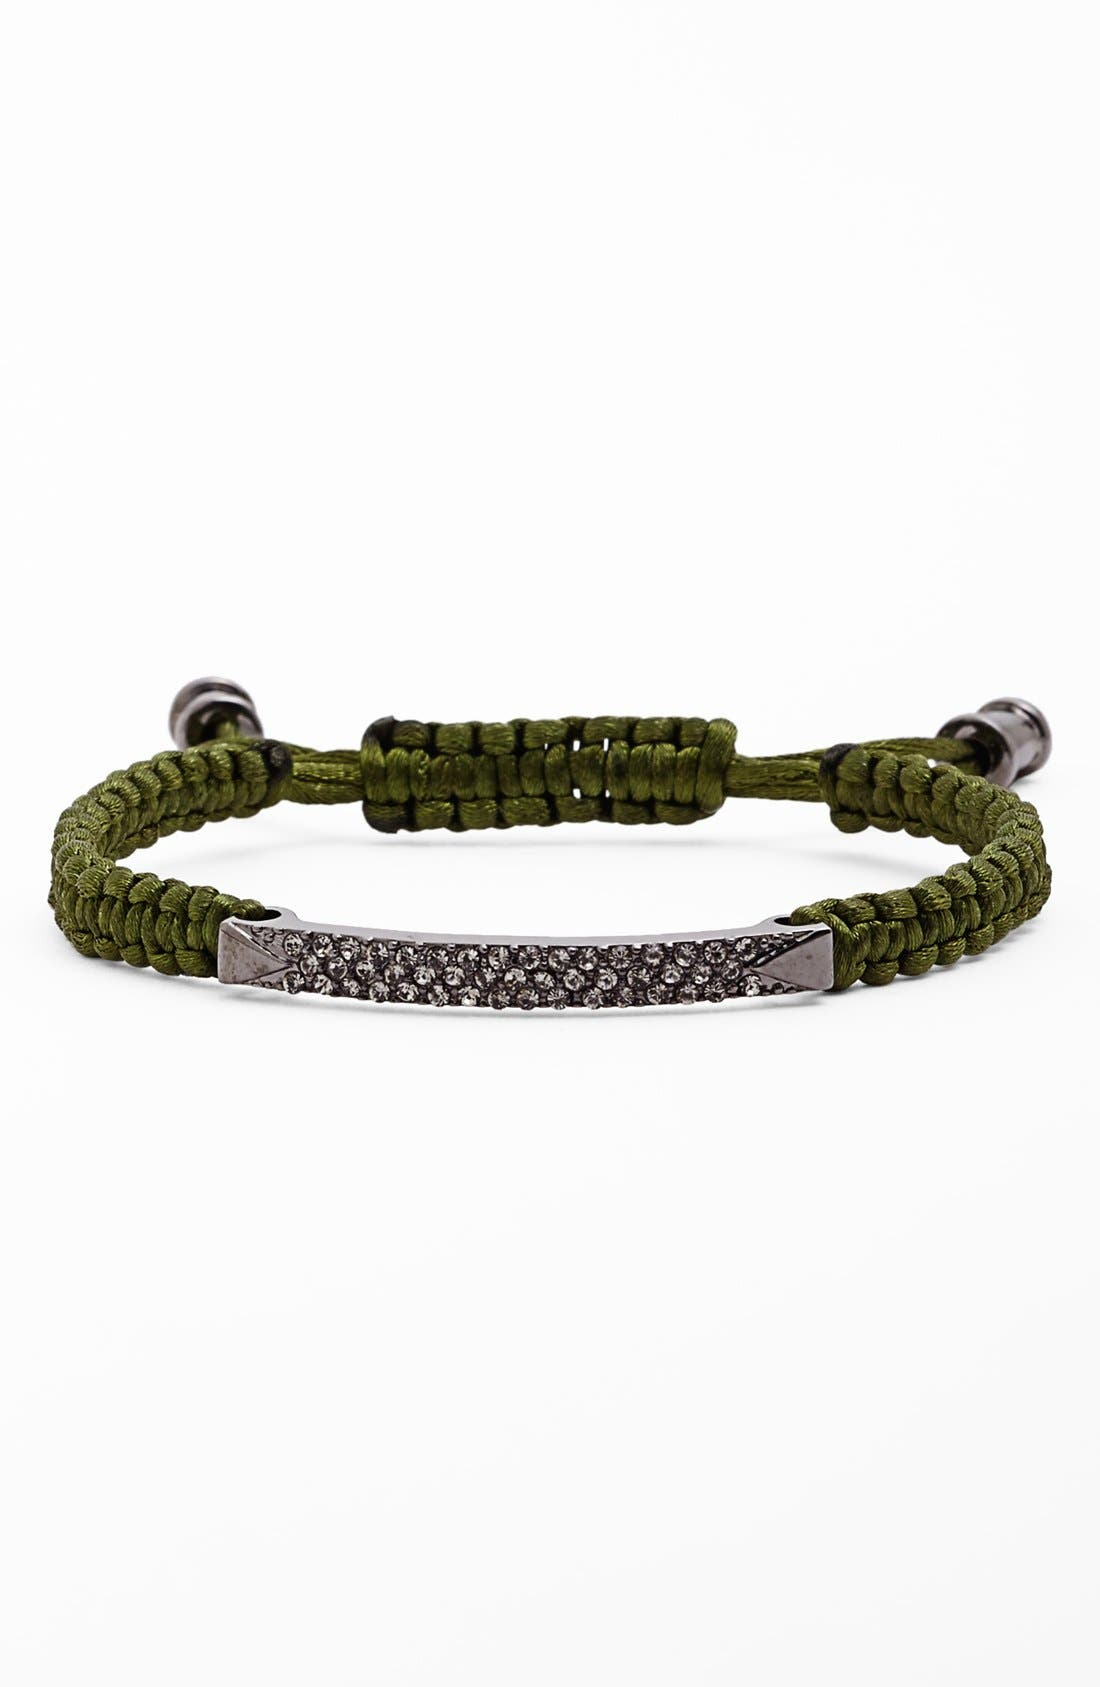 Alternate Image 1 Selected - Vince Camuto 'Tour of Duty' Macramé ID Bracelet